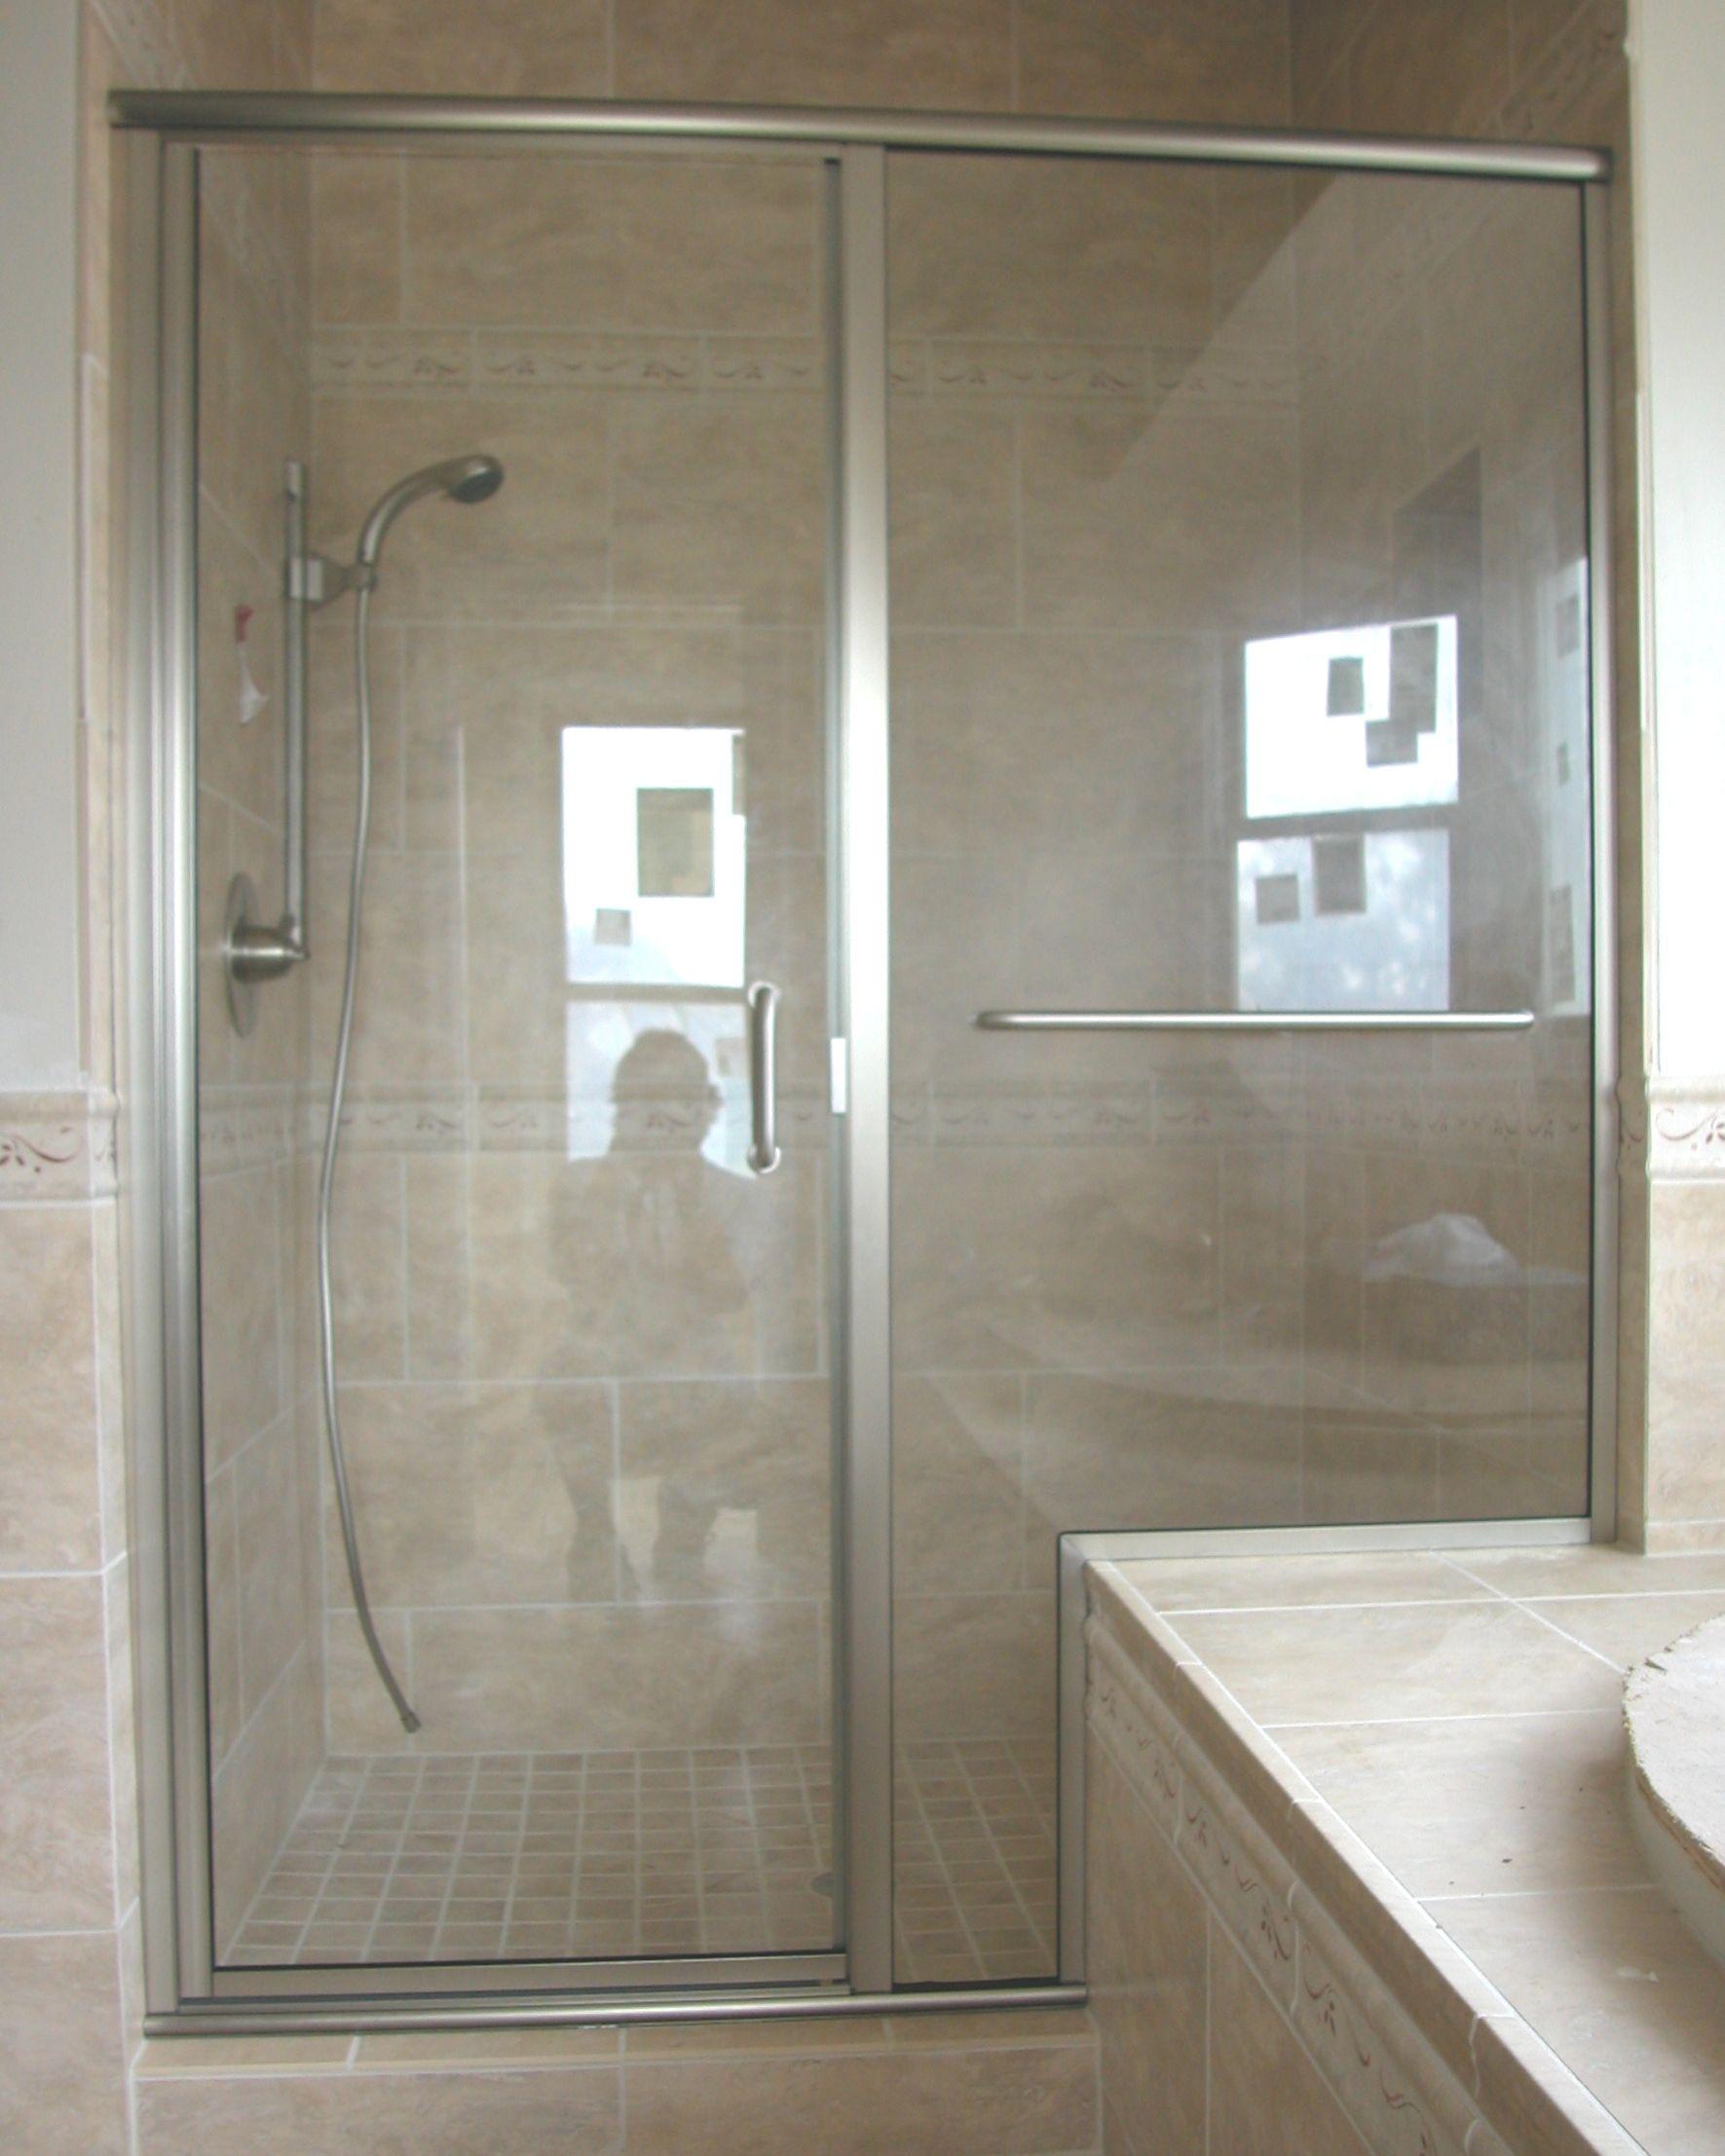 King Glass Shower Door Towel Bar Glass Doors Pinterest Shower